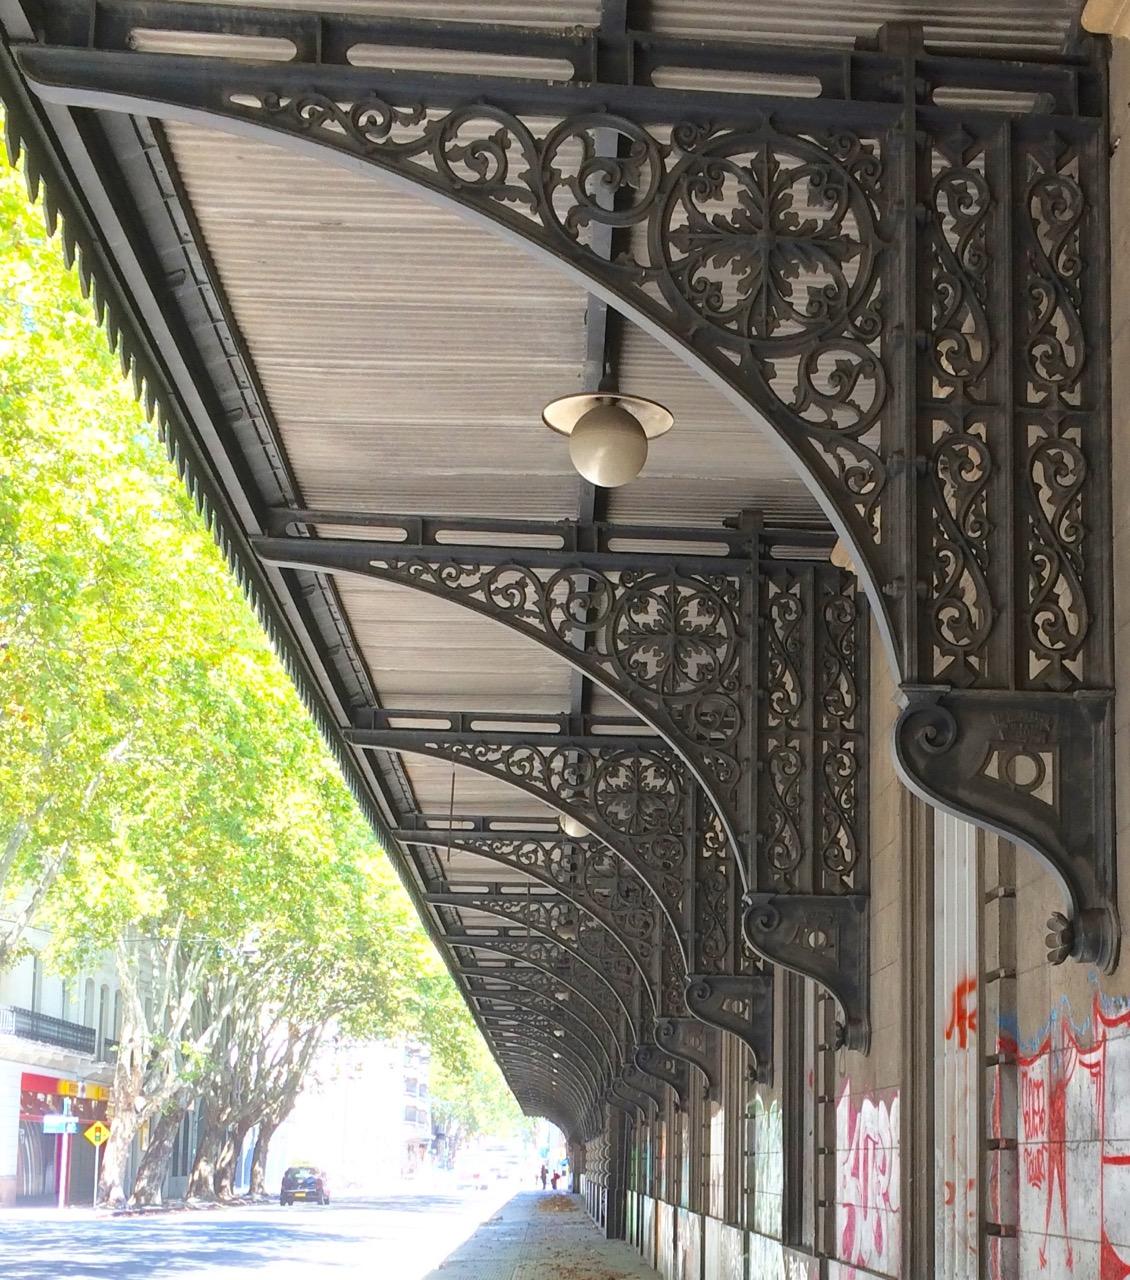 The former central station: building detail